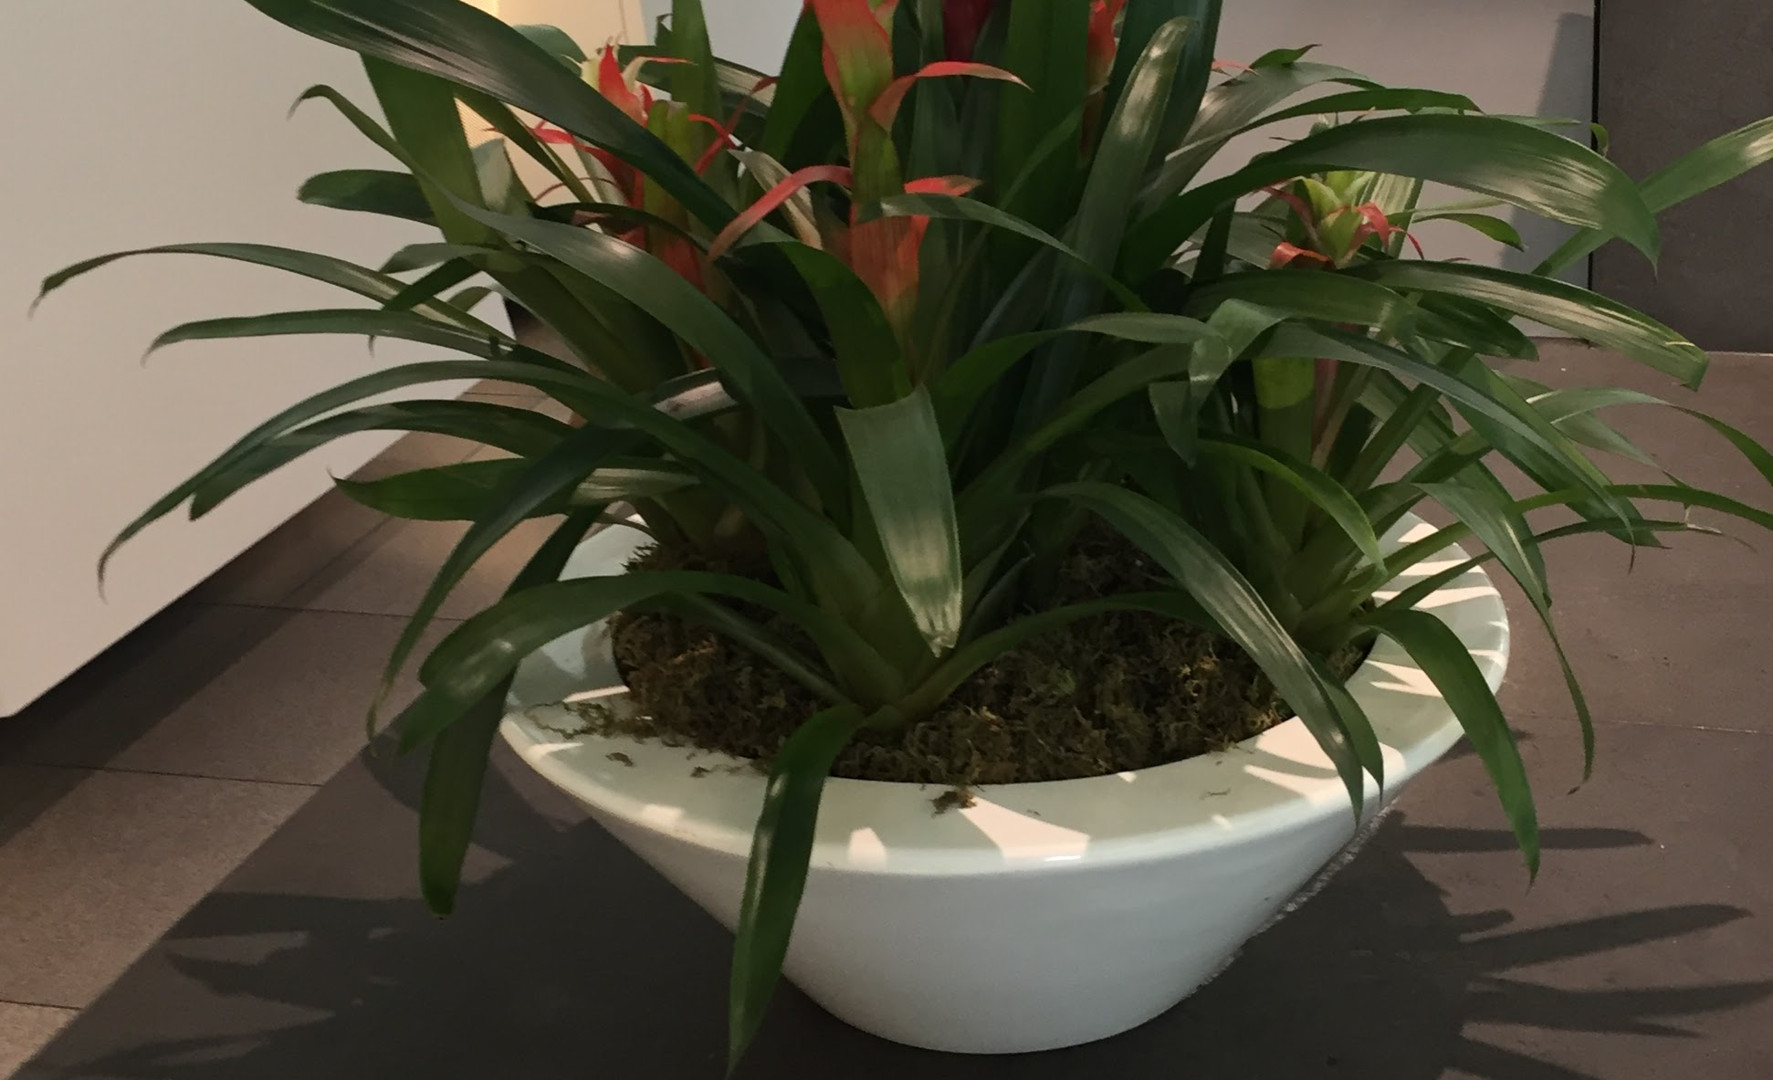 Bowl with Bromeliad by Plantera